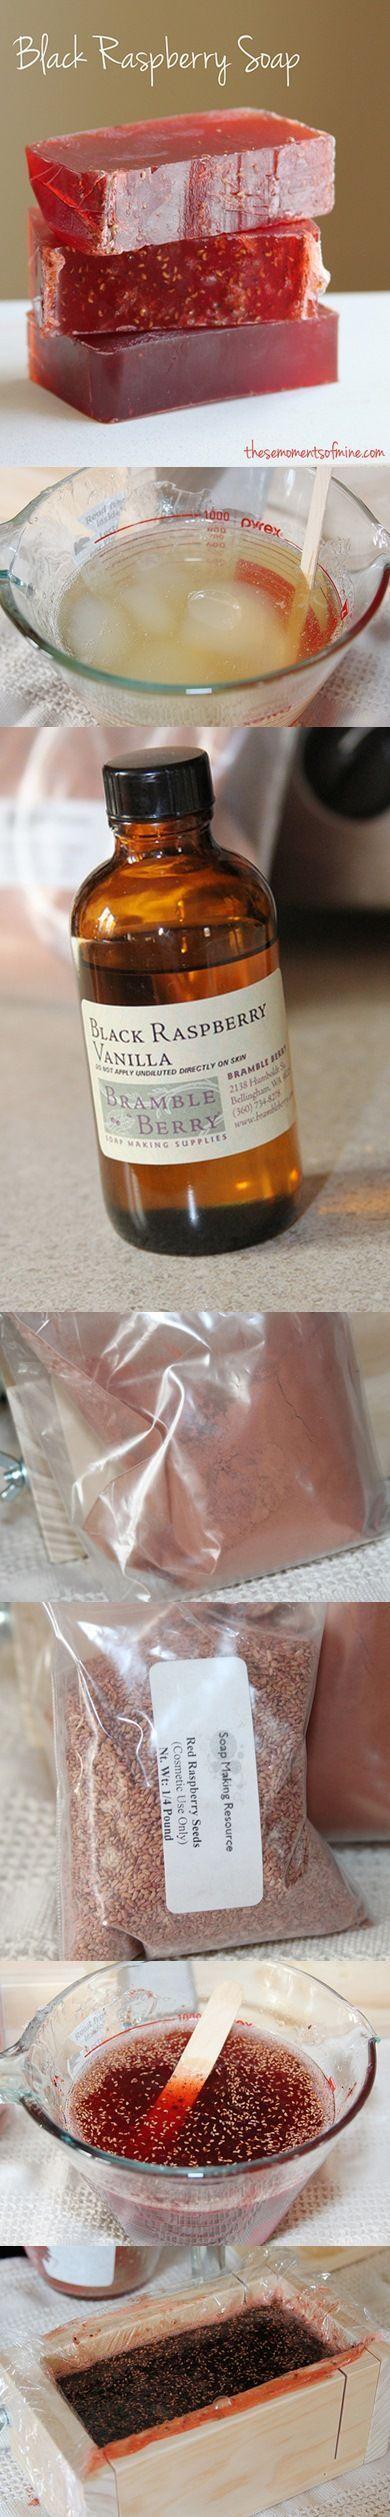 DIY Black Raspberry Soap  | followpics.co